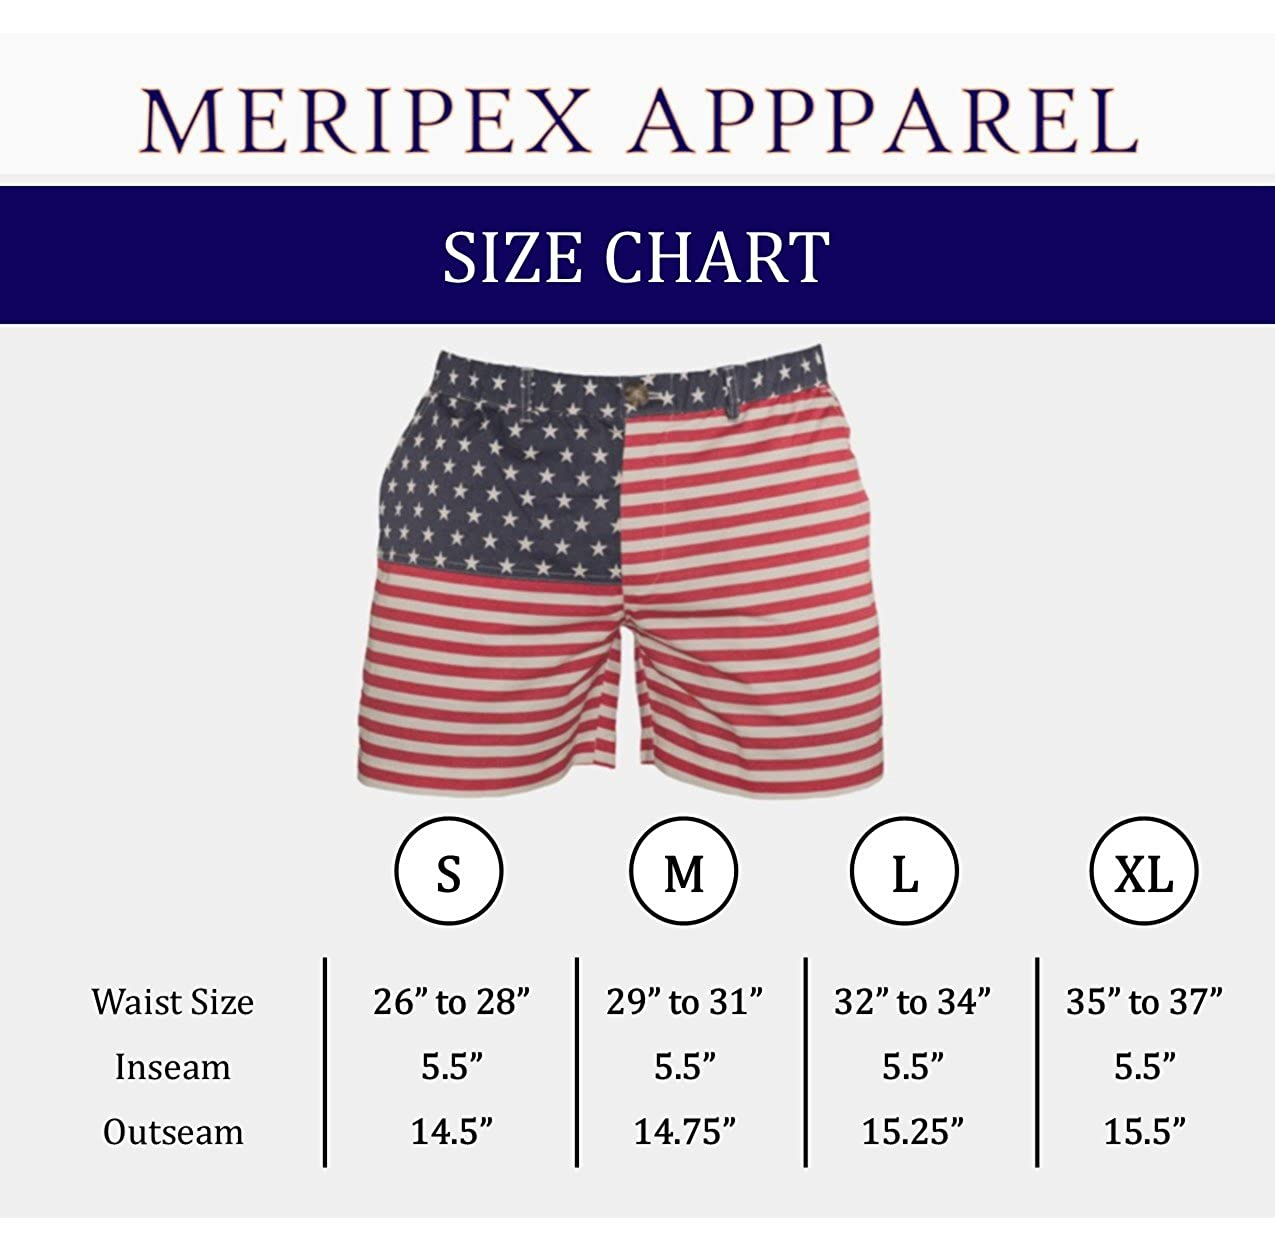 d9b670f724 Meripex Apparel American Flag Men's 5.5 Inseam Elastic-Waist Shorts ...